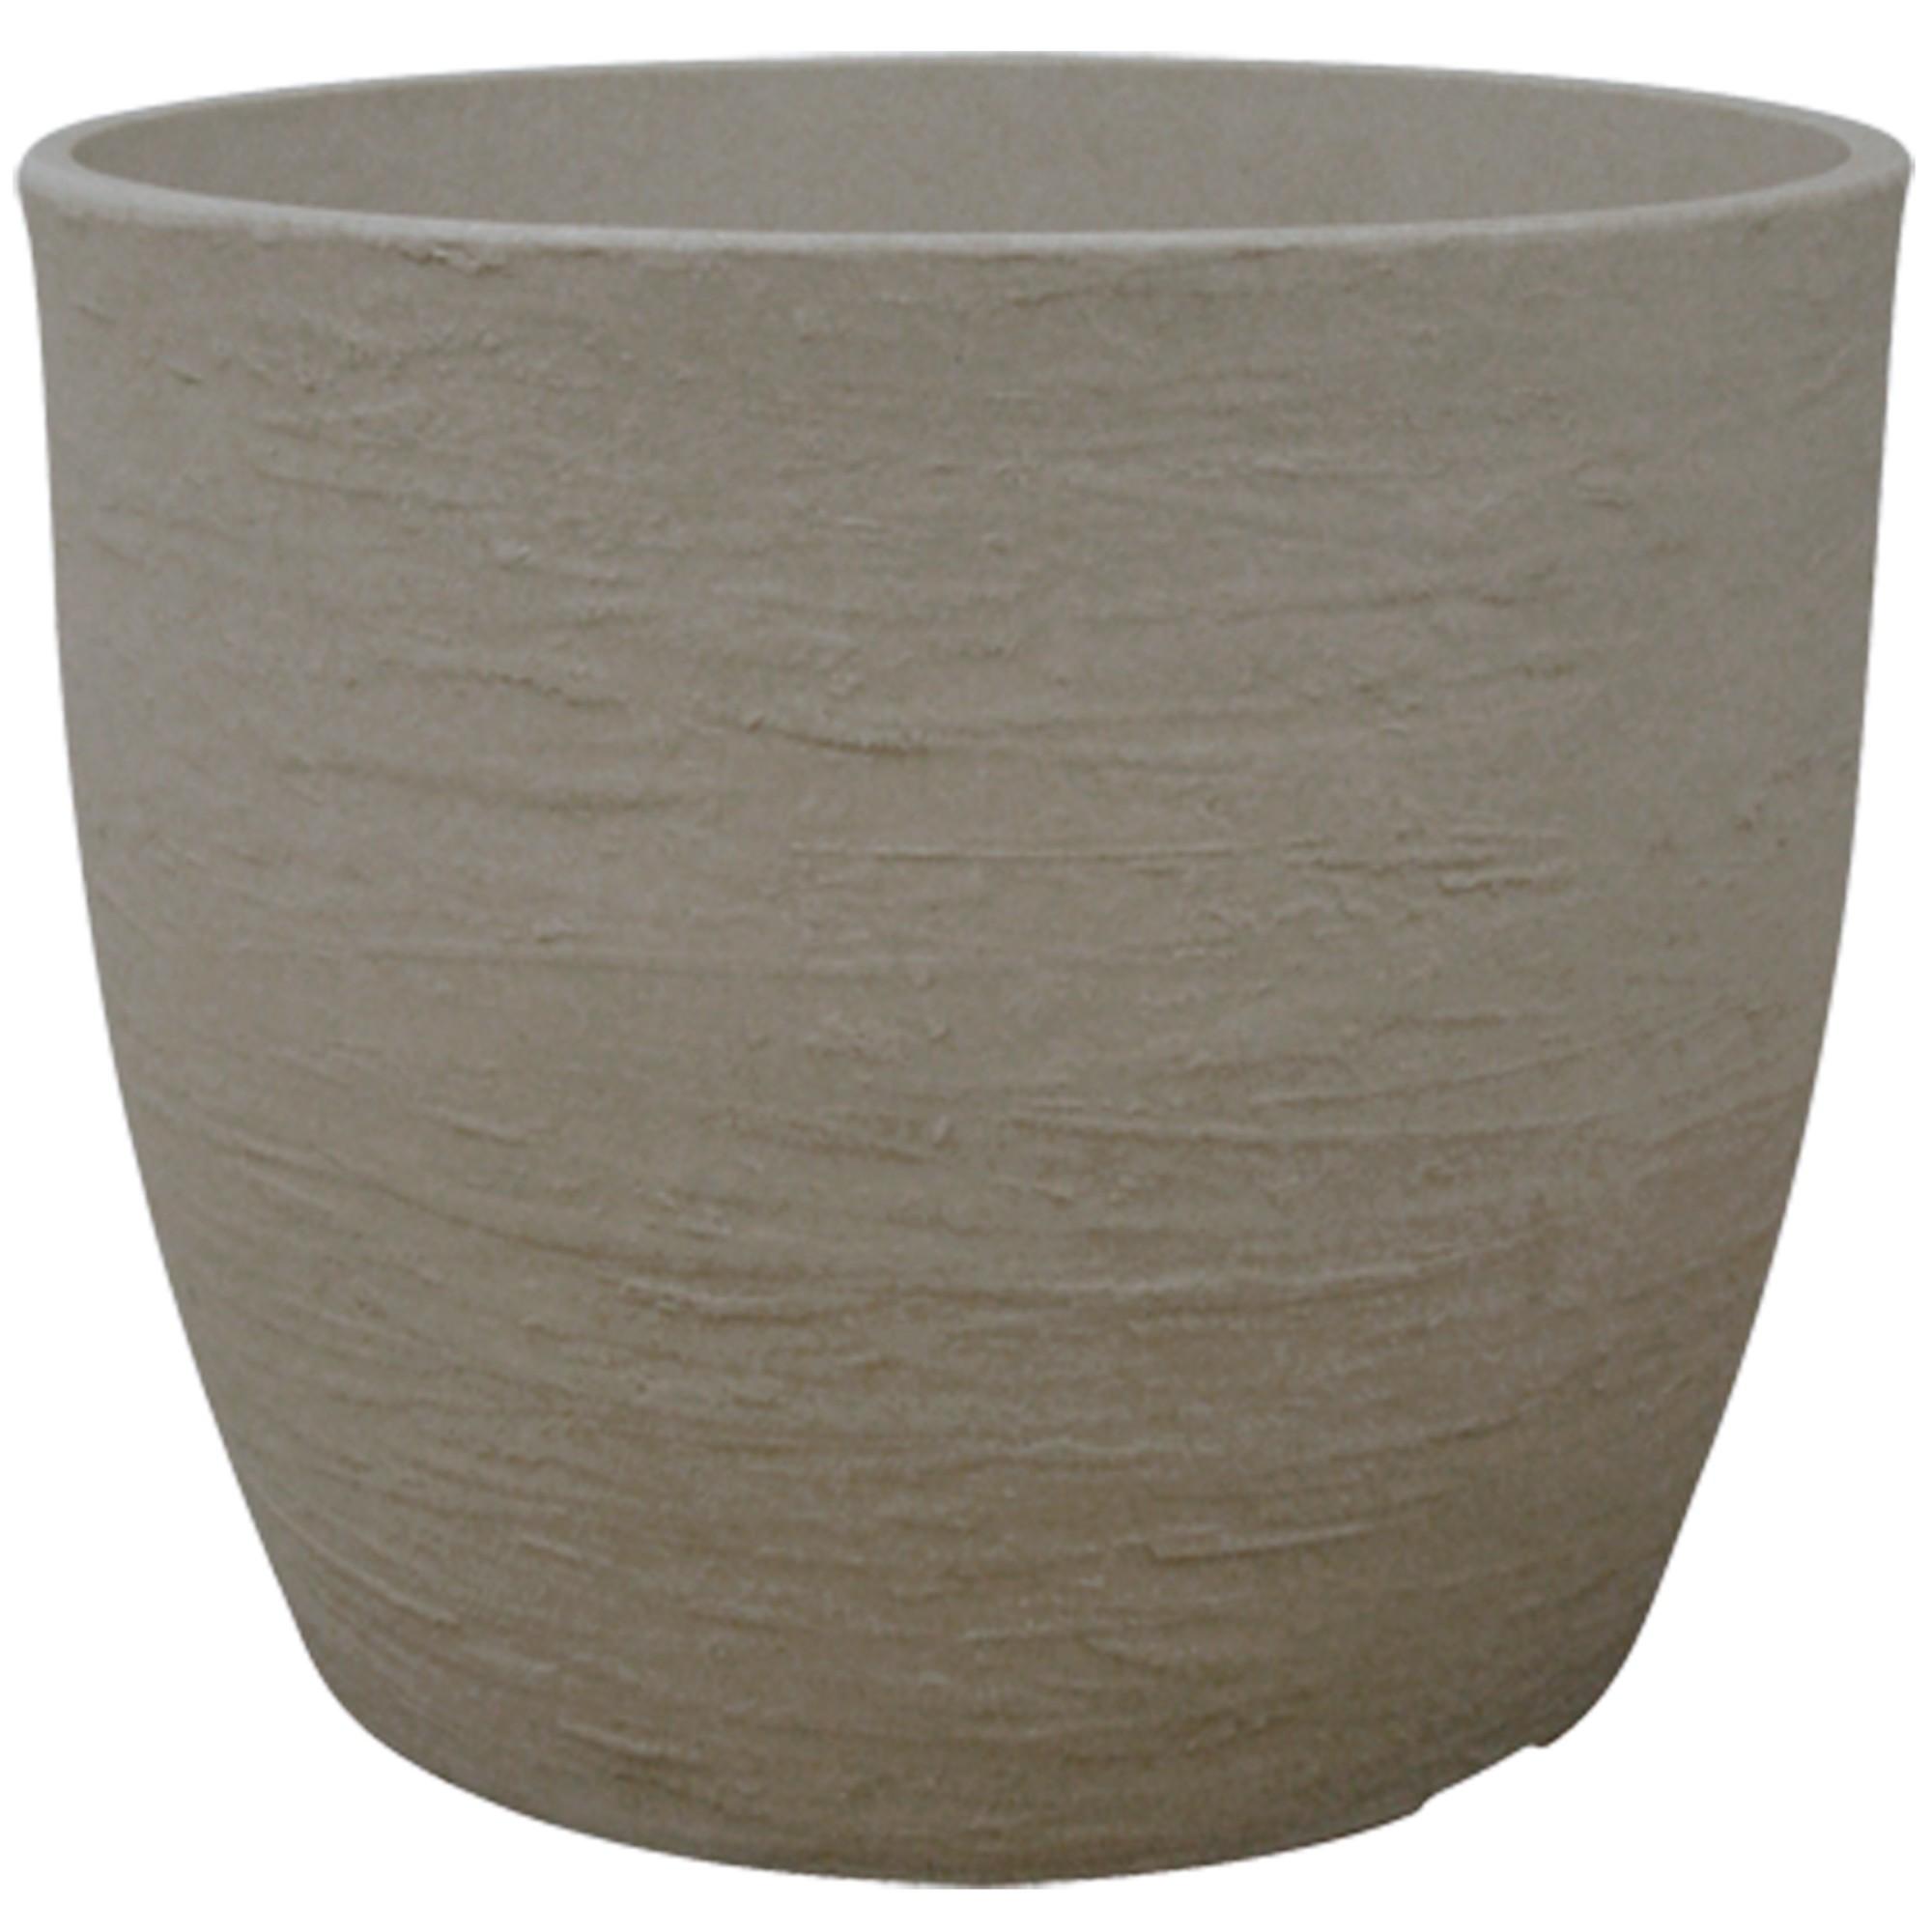 Vaso para Plantas Polietileno 42x51 cm Europa Marmore - Japi